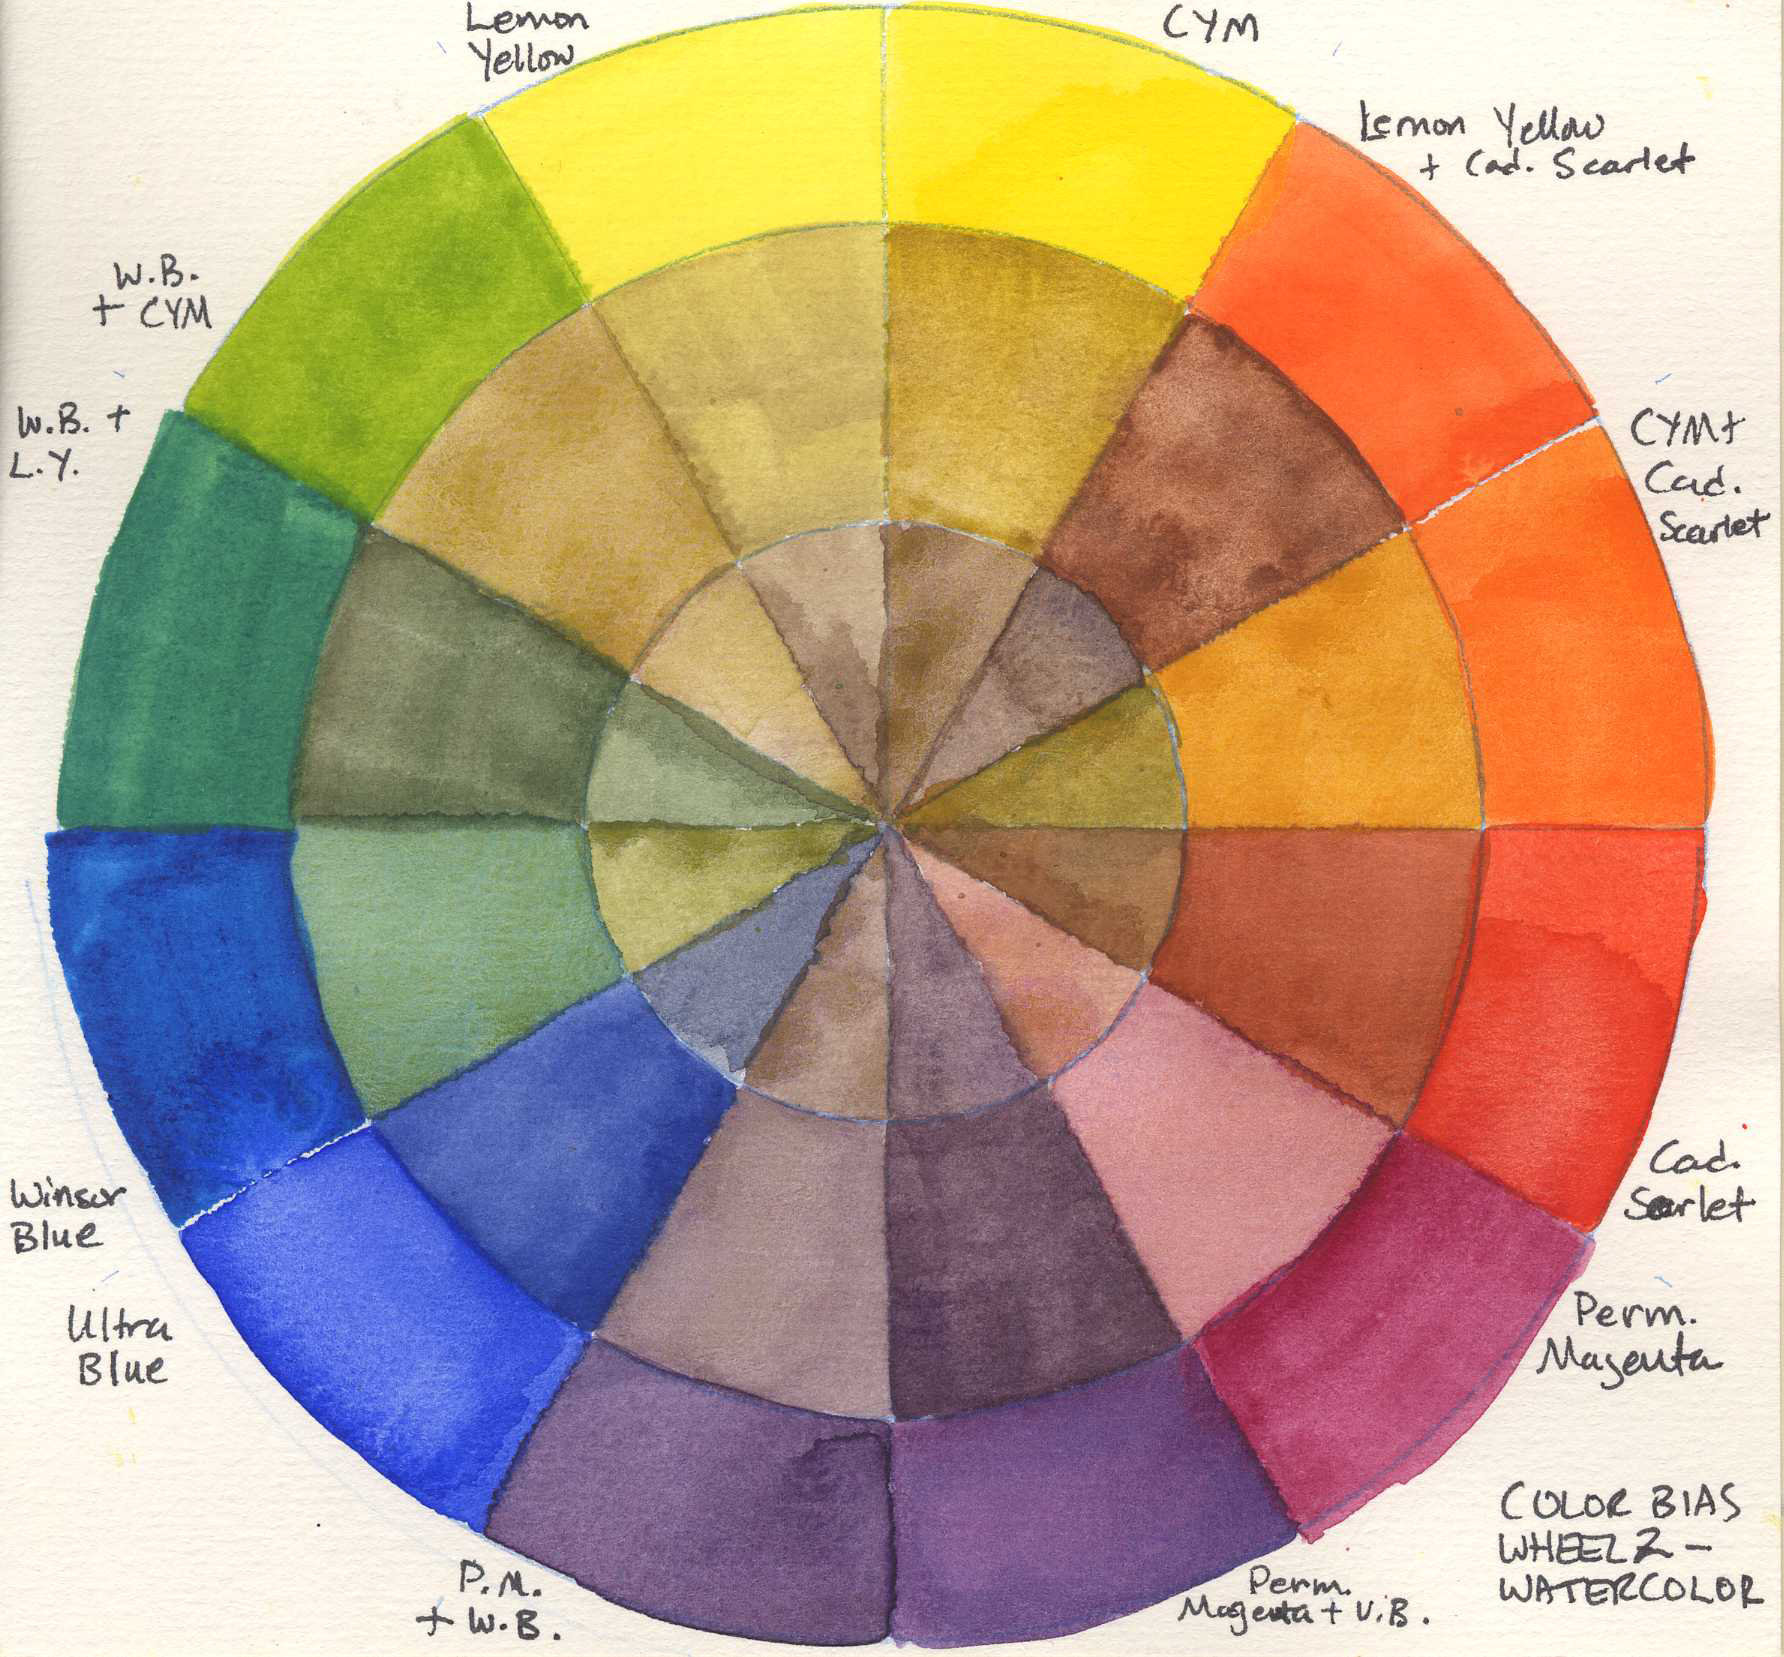 Color-mixing-chart-Watercolor-6-color-2-037